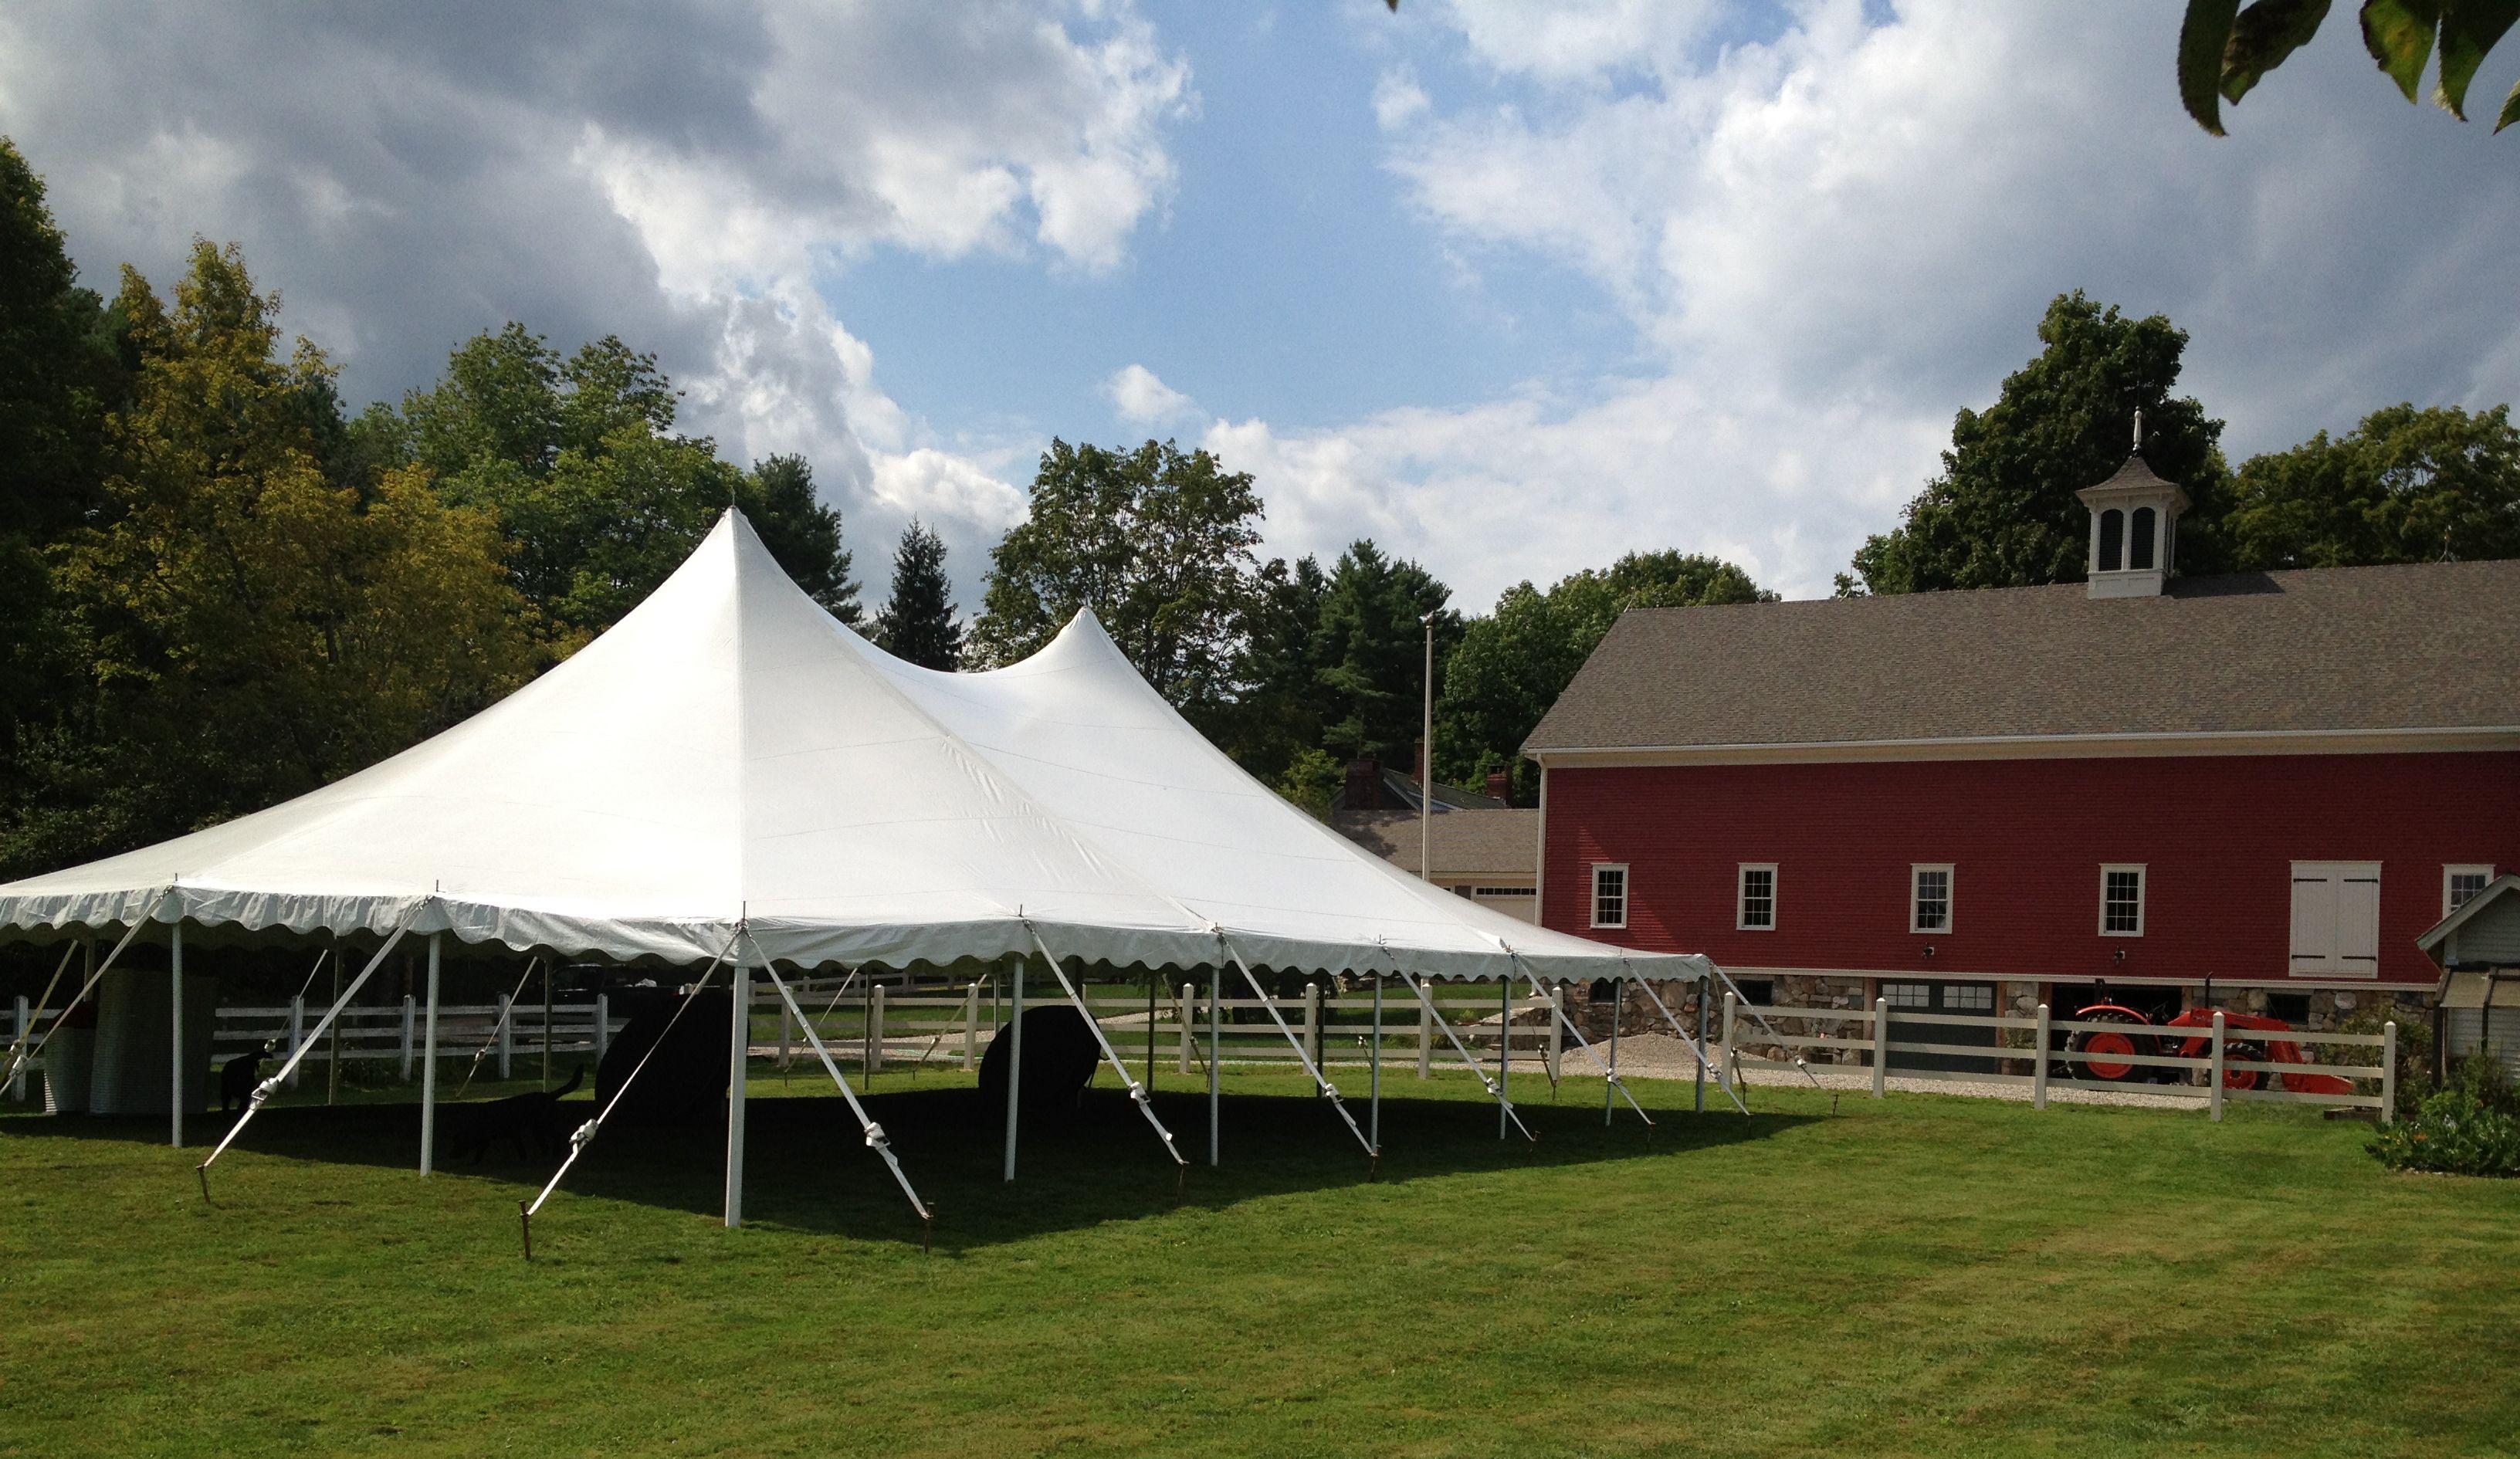 New England Tent Awning Brunswick Maine Visit Full Profile Http Gayweddingsinmaine Com New England Tent And A Seaside Village Tent Awning Damariscotta